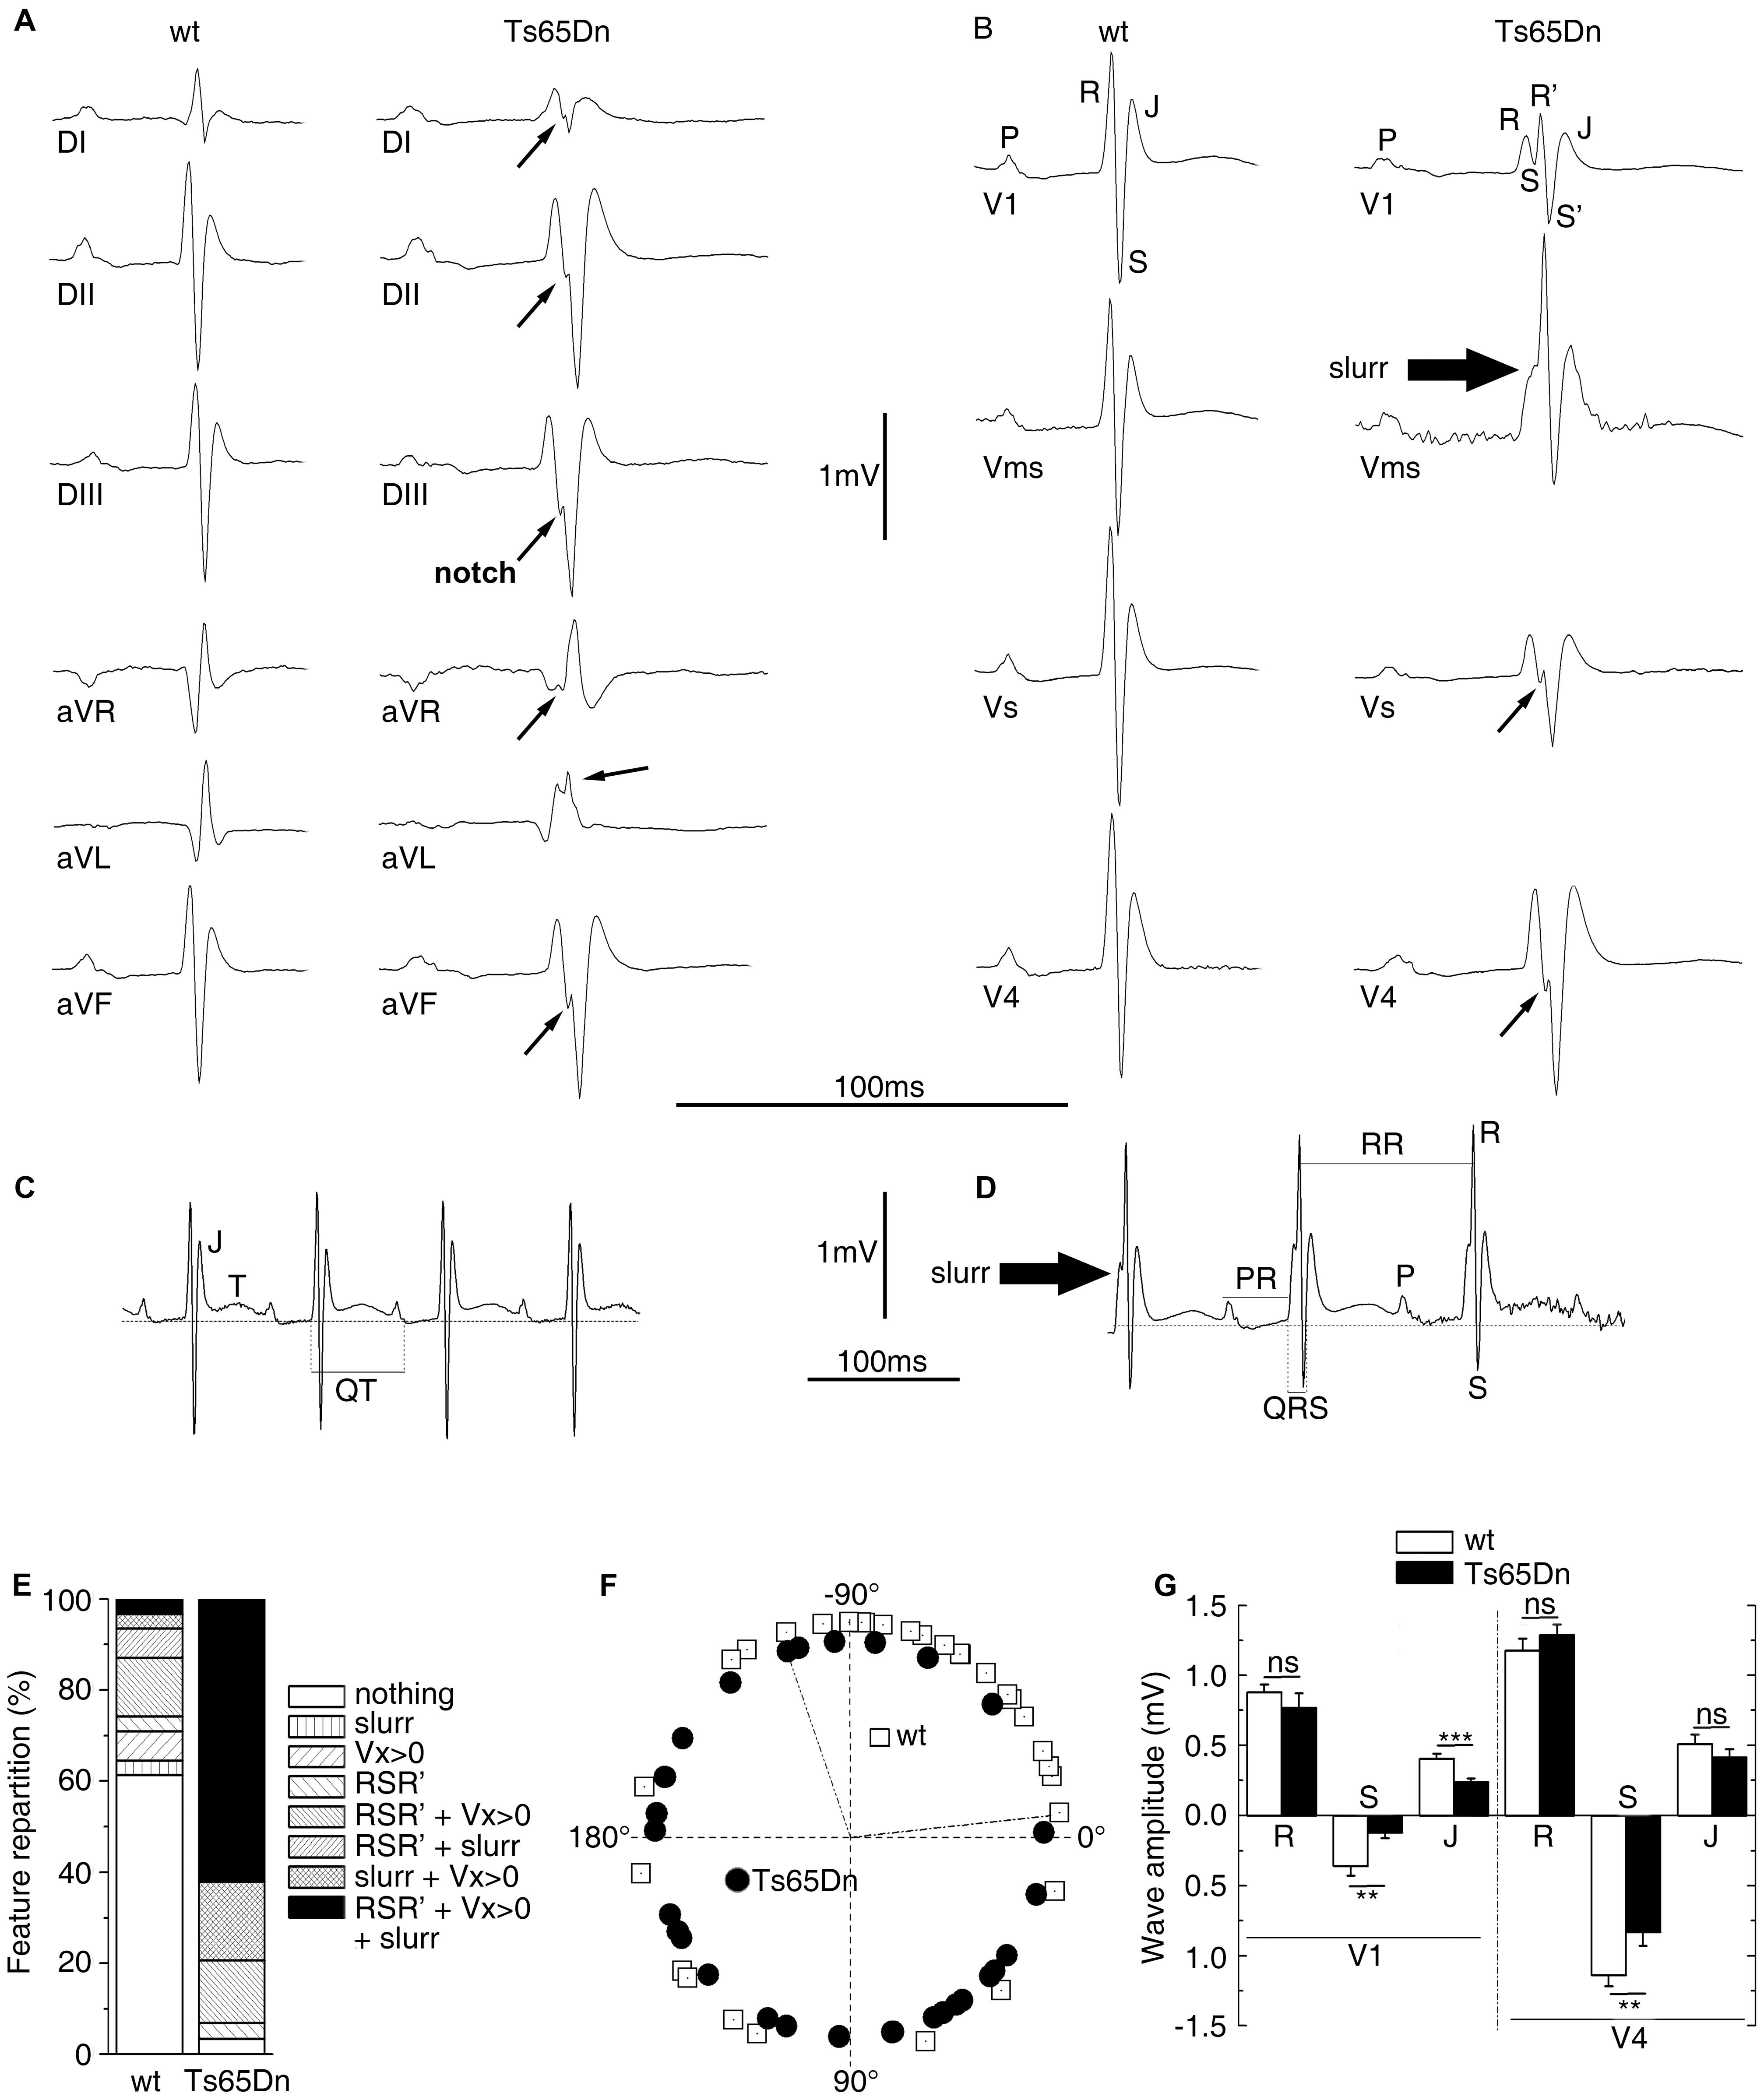 ECG analyses of urethane anaesthetized Ts65Dn adult mice revealed cardiac conduction anomalies.